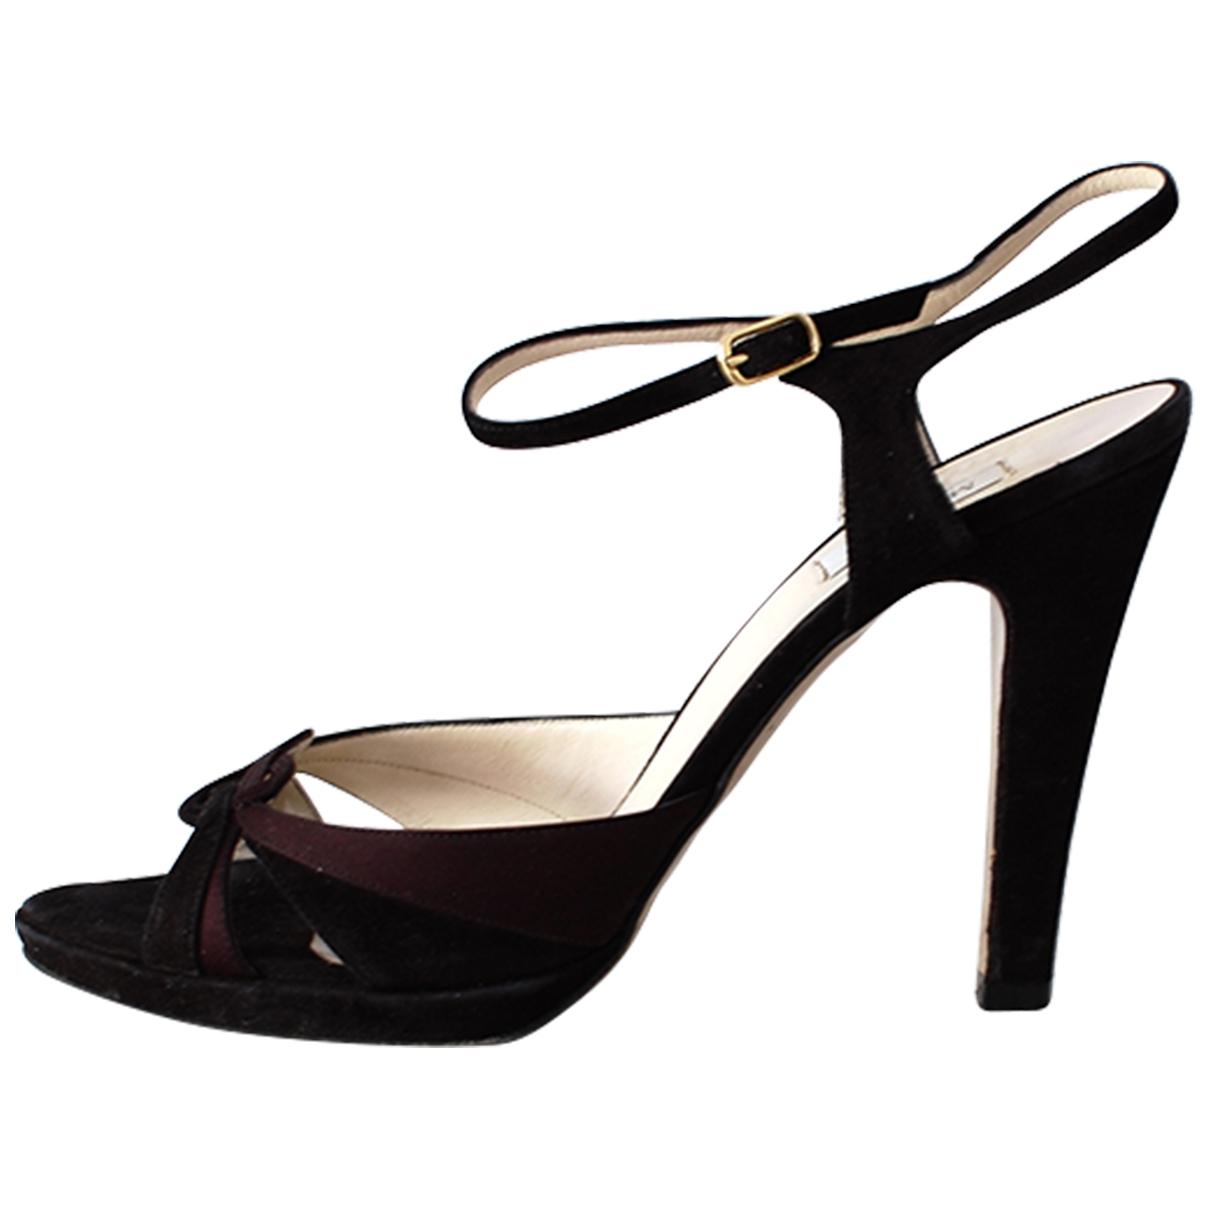 Max Mara \N Black Suede Sandals for Women 40 IT